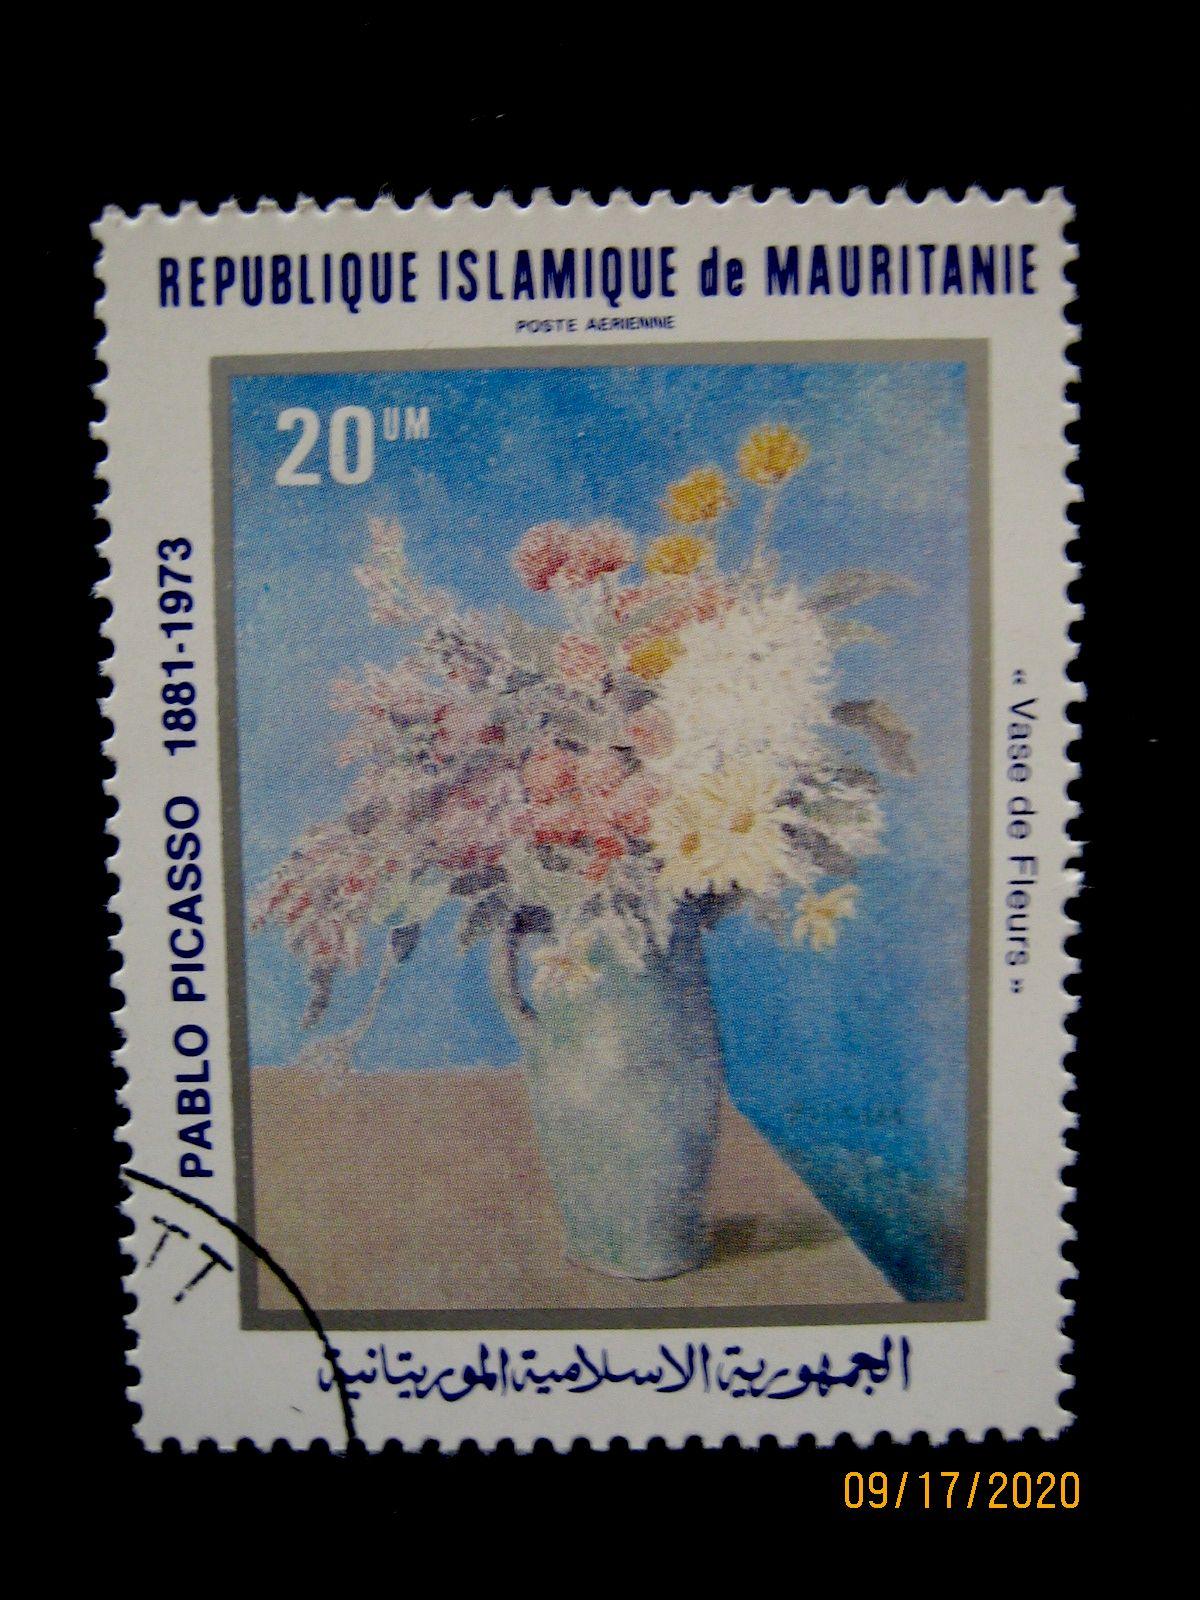 Марка 1981-06-29 Мавритания (Исламская Республика Мавритания), номиналом: 20кхумов (um)—  Пабло Пикассо «Ваза с цветами» Mi:MR 722, Sn:MR C208, Yt:MR PA205, Sg:MR 696